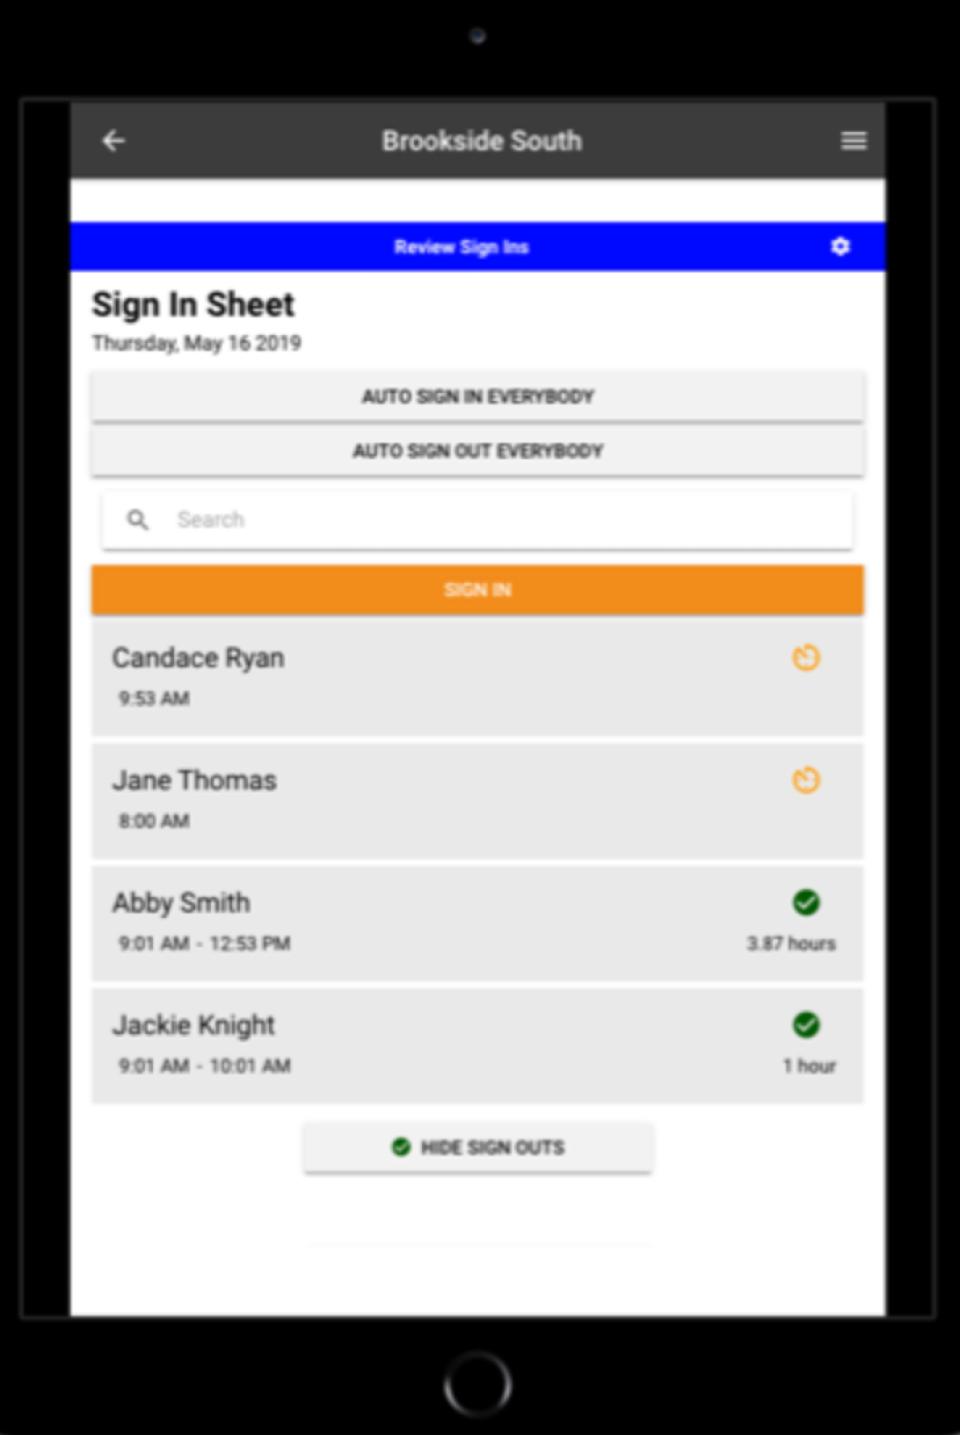 Volunteer Check In Kiosk screenshot: Volunteer Check In Kiosk sign in sheet